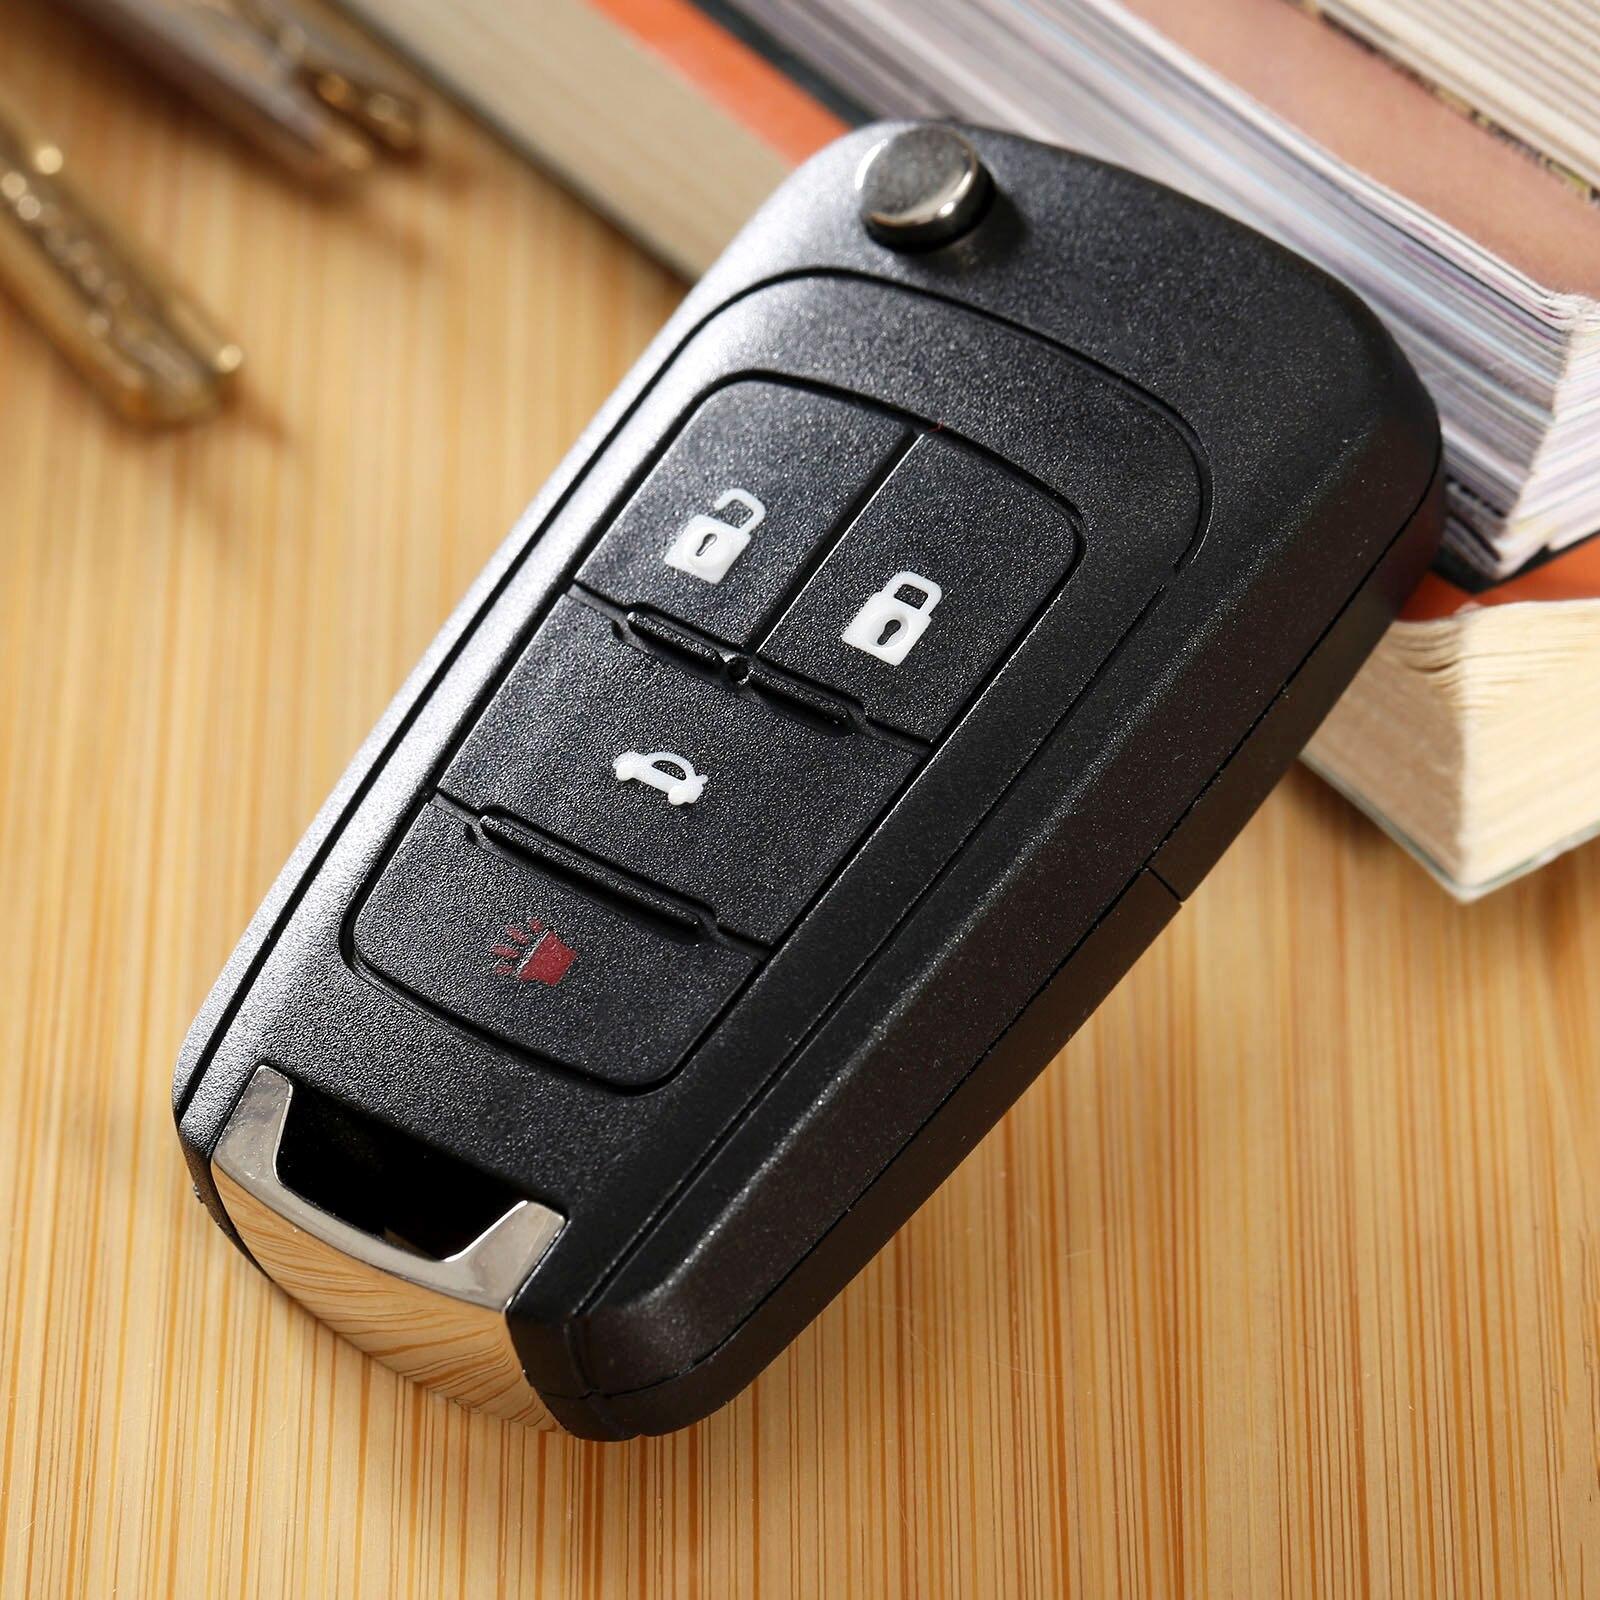 Auto Vervanging Folding Flip Remote Key Case Shell Voor Chevrolet Camaro Cruze Equinox Malibu Sonic Spark Volt 4 Knoppen Entry Fob Goederen Van Hoge Kwaliteit